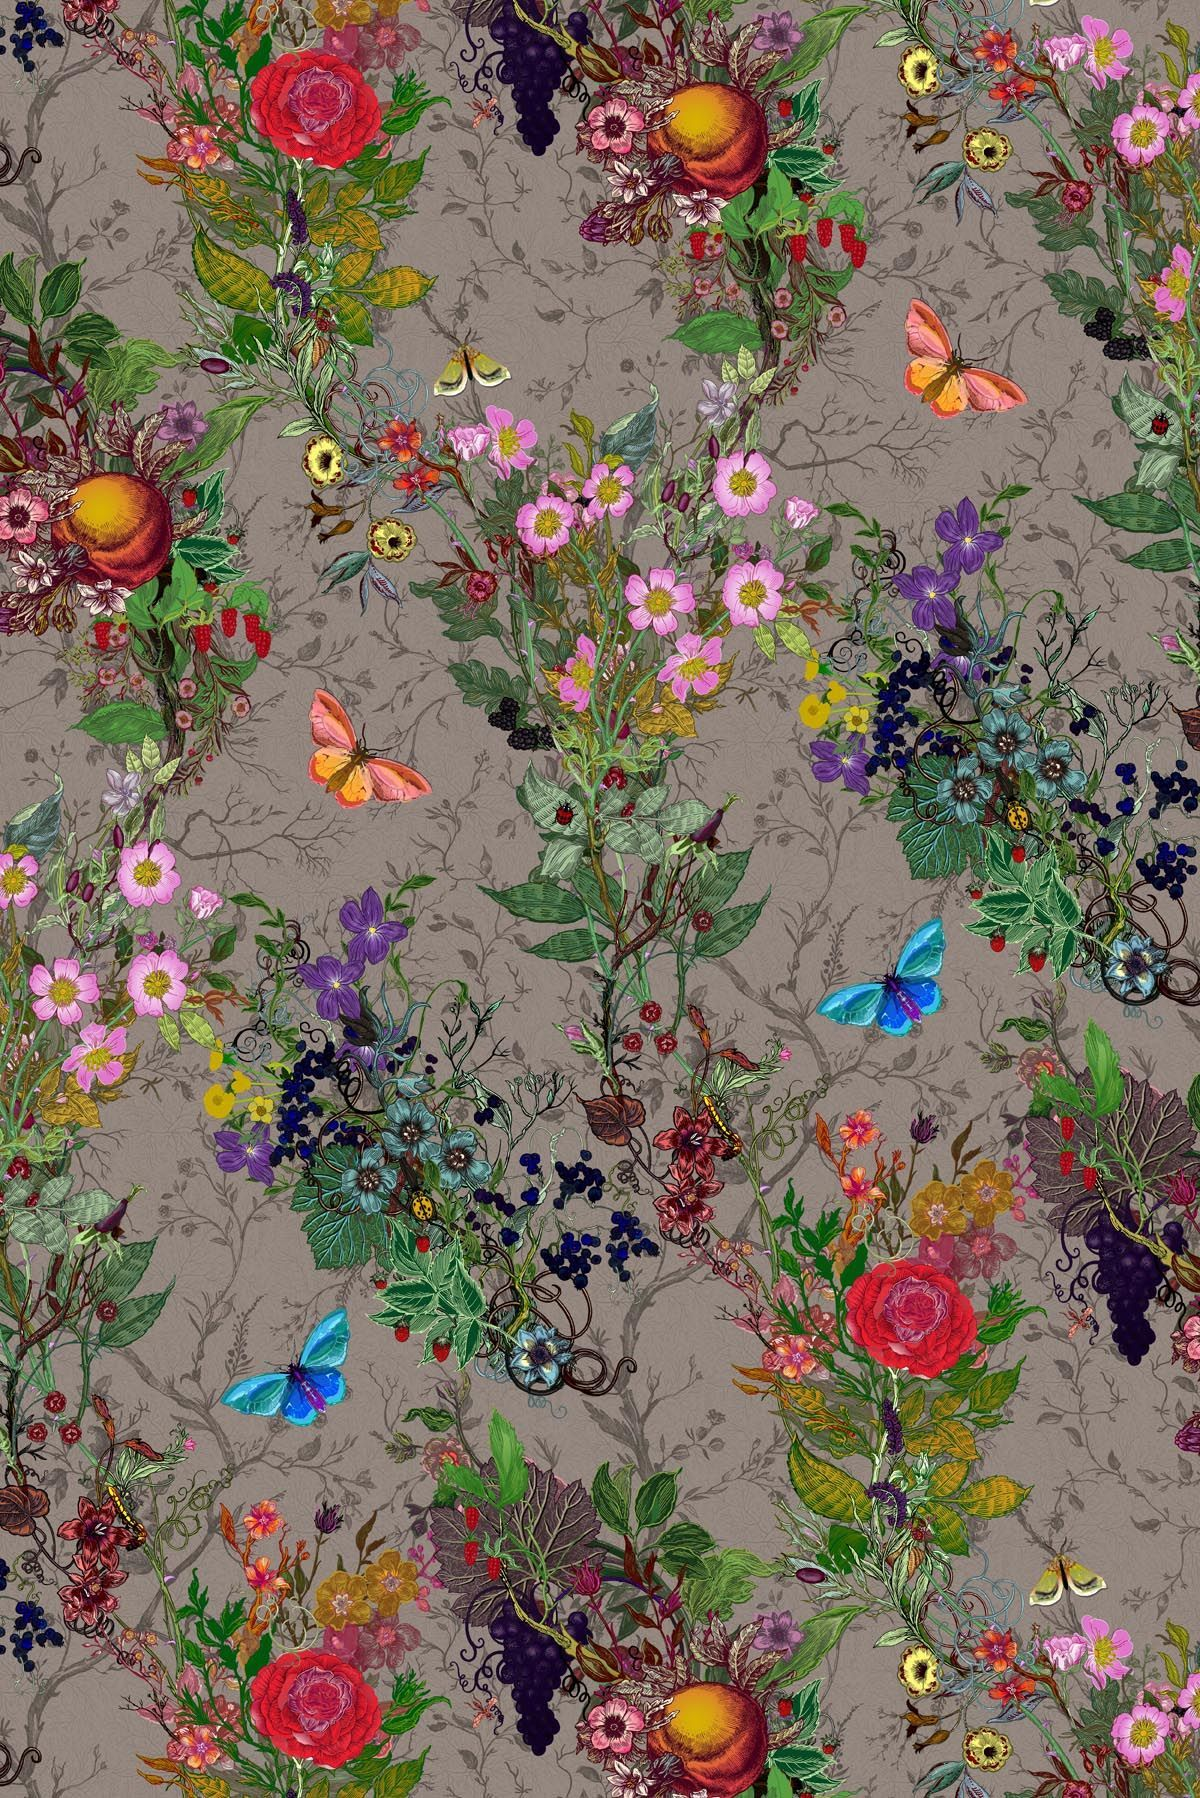 High Quality Timorous Beasties Fabric   Bloomsbury Garden : Botanical : Florals